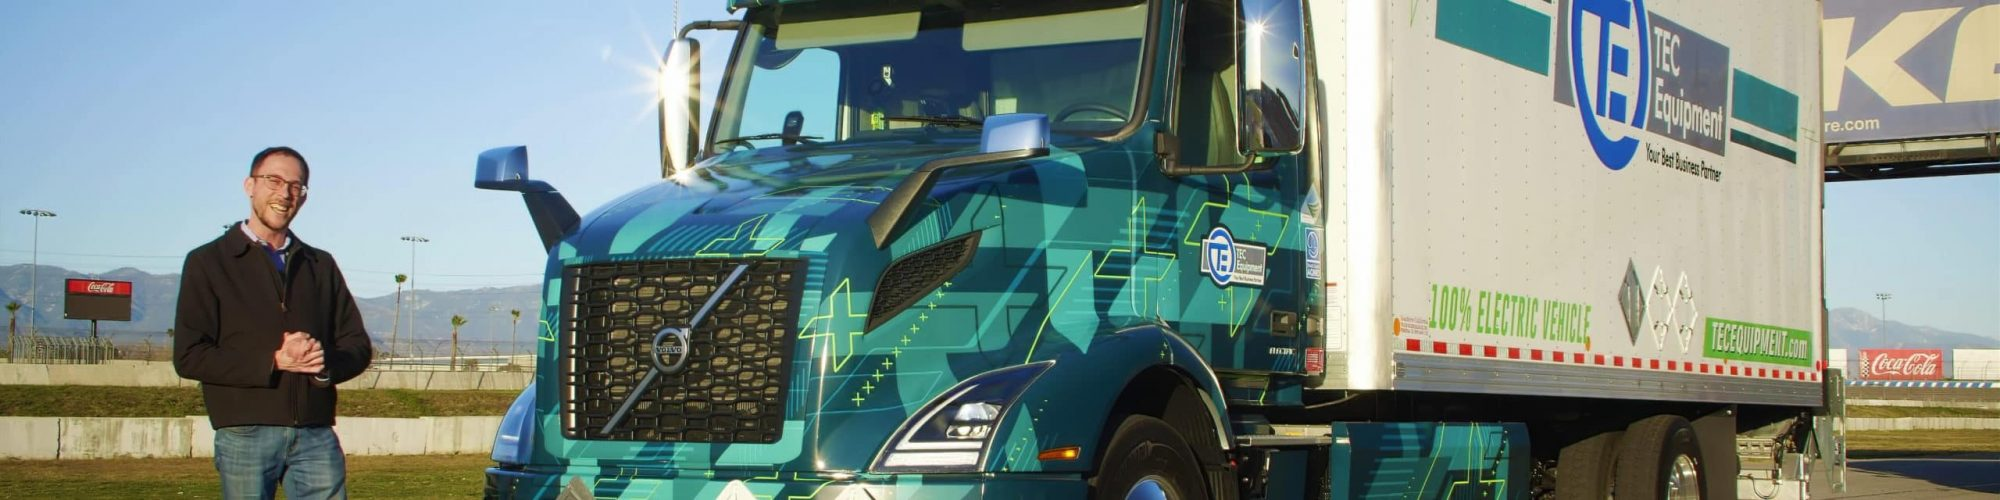 electric-trucks-california-oct-2020